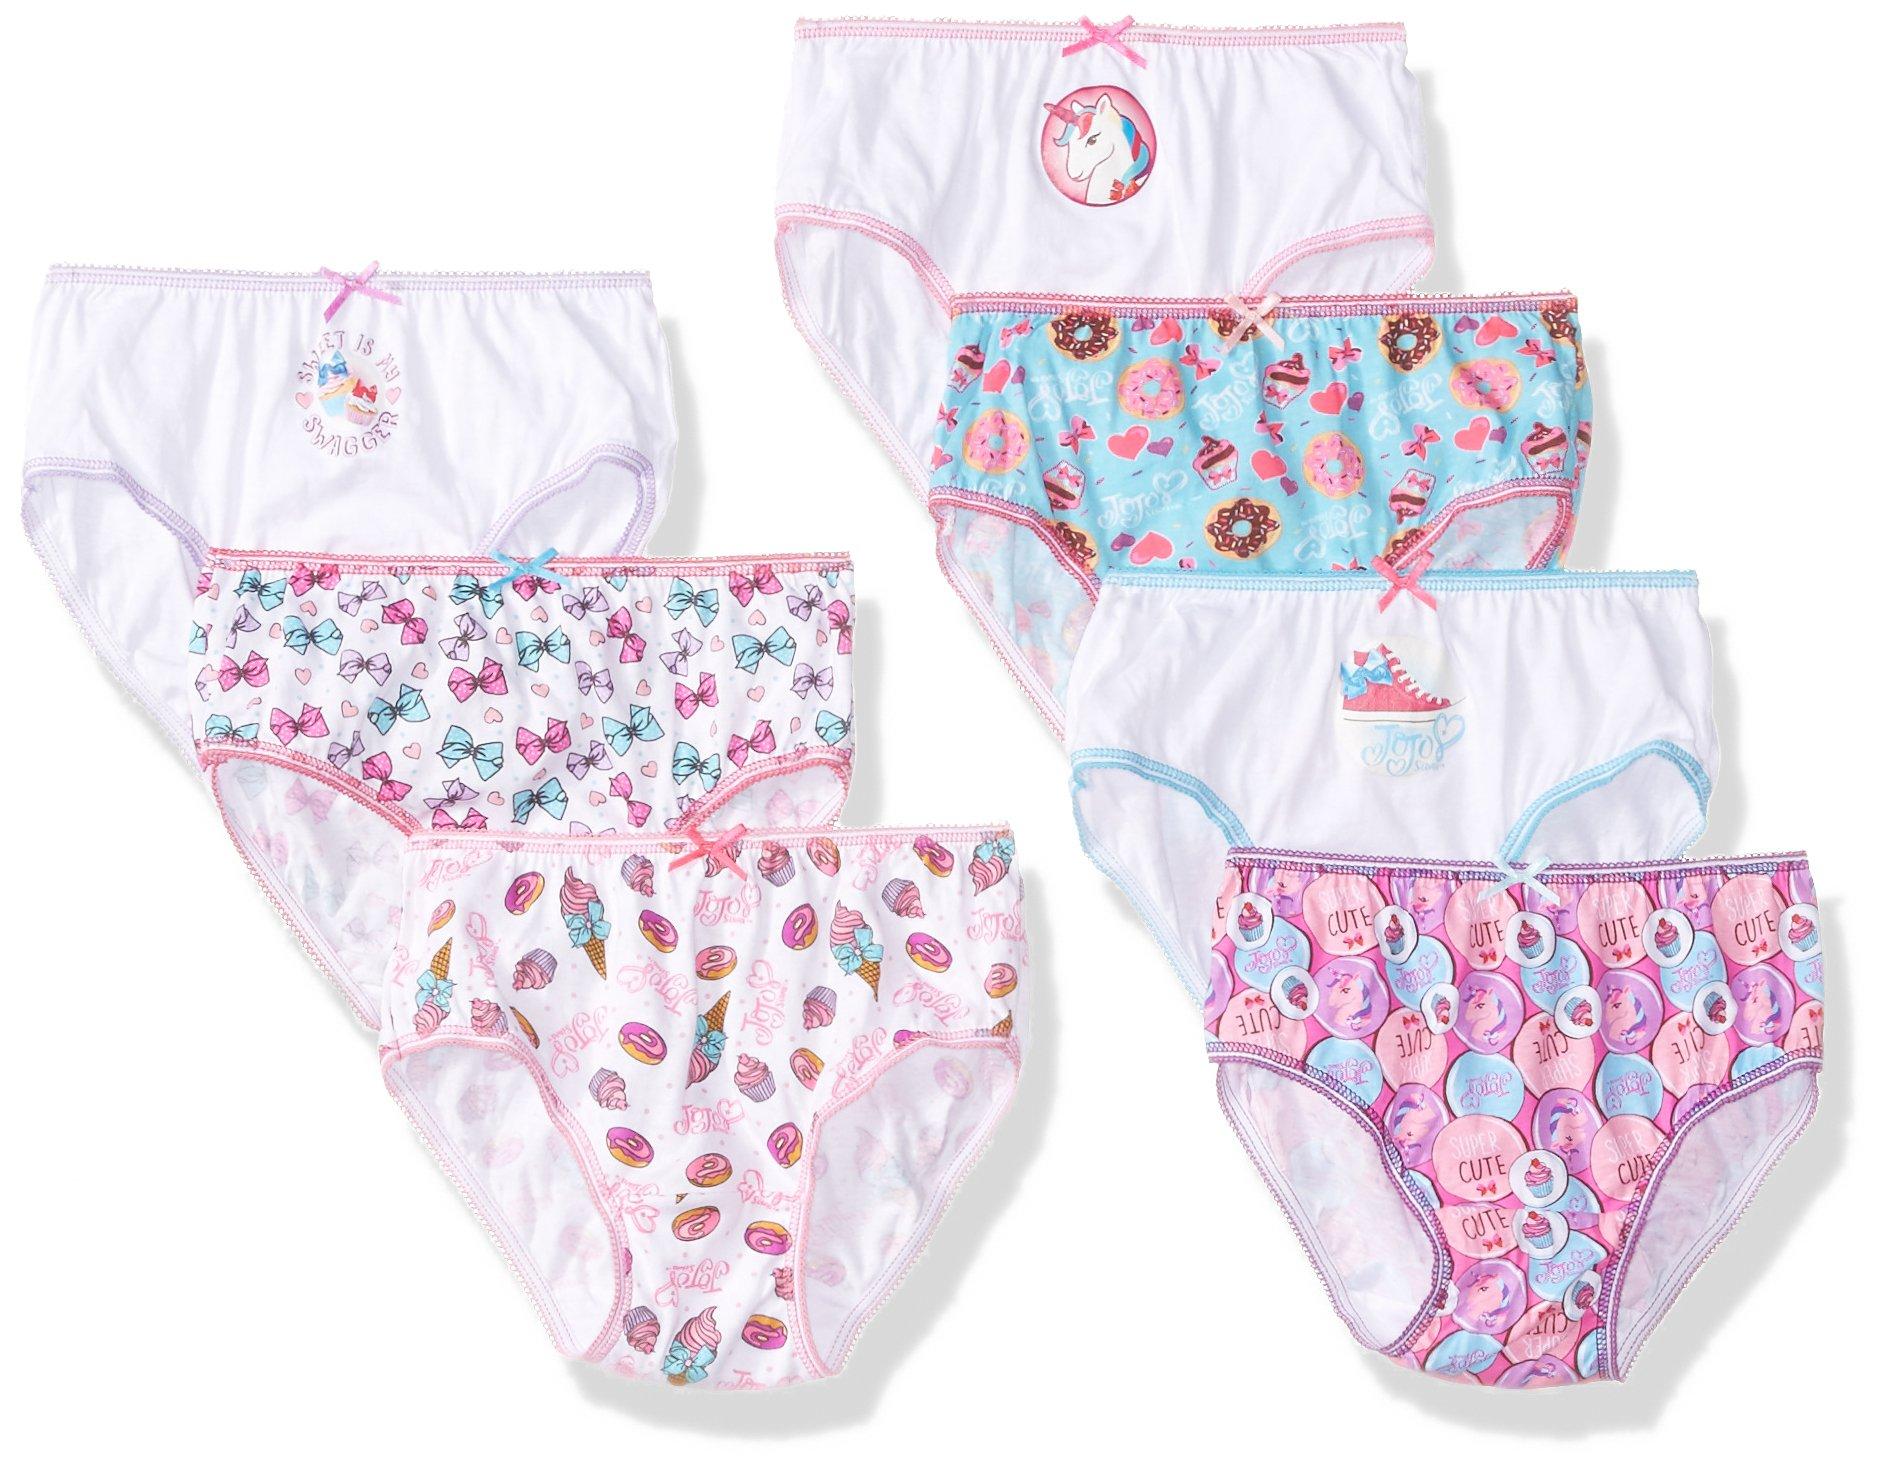 Nickelodeon Little Girl's 7-Pack JoJo Siwa Bikini Brief Underwear